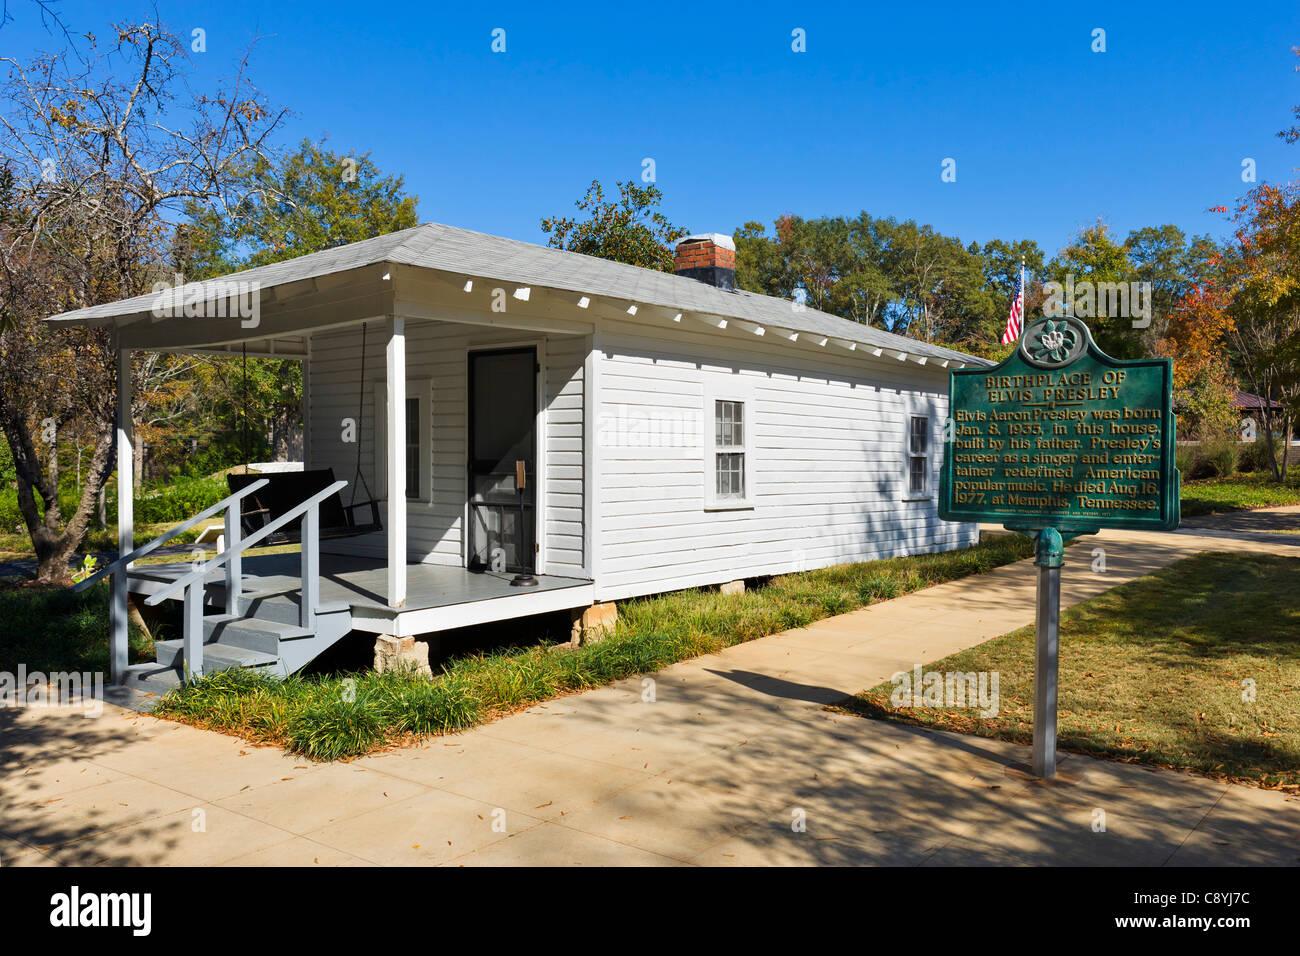 Elvis Presley's Birthplace, Tupelo, Mississippi, USA - Stock Image